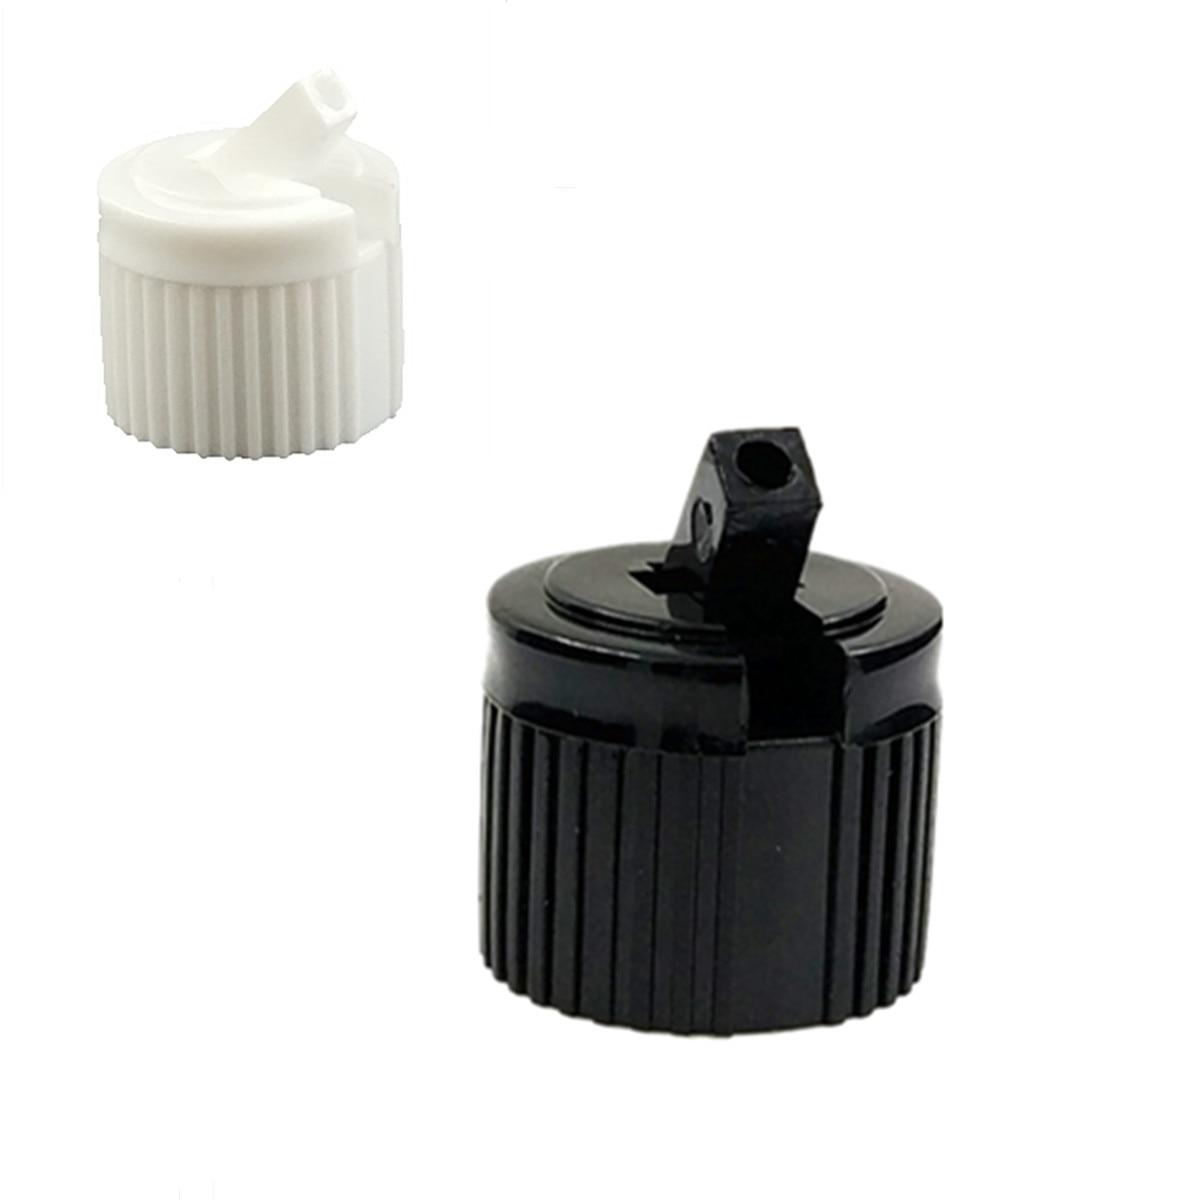 20-410 Ribbed Side Plastic Spout Top Caps Dispensing TURRET Cap 10pc